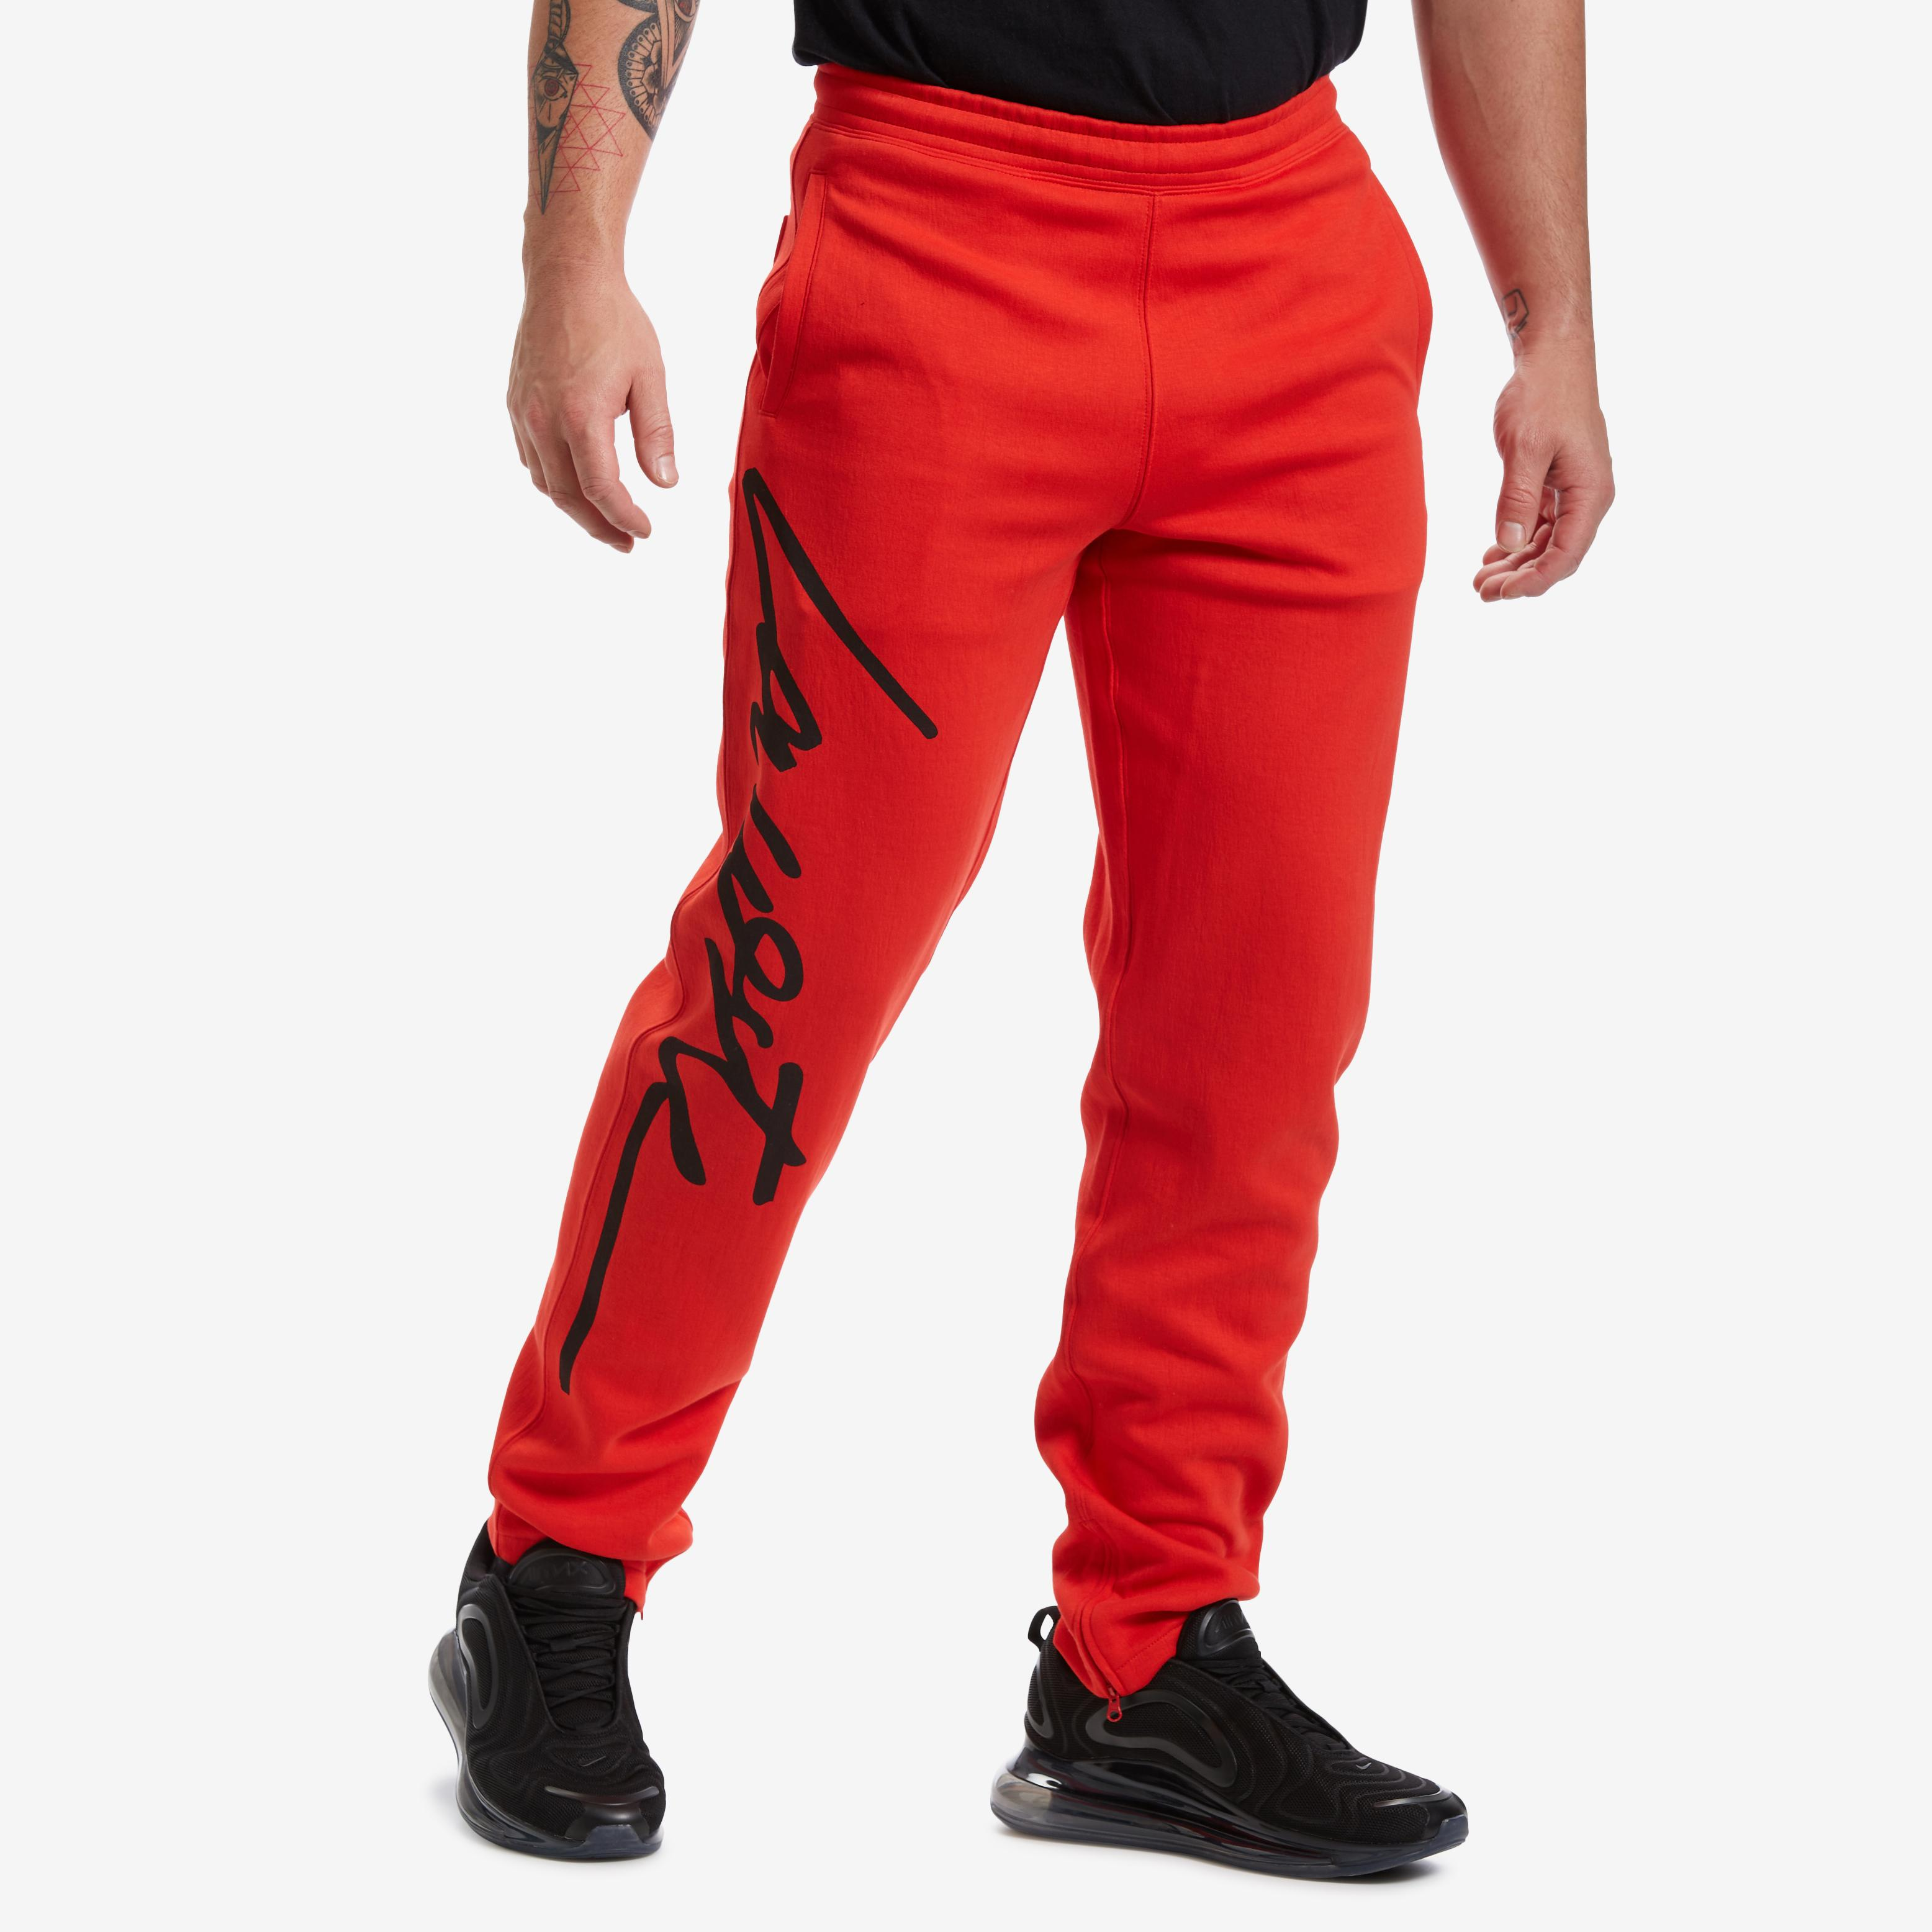 Men's Unisex Live Signature Textured Fleece Sweatpants